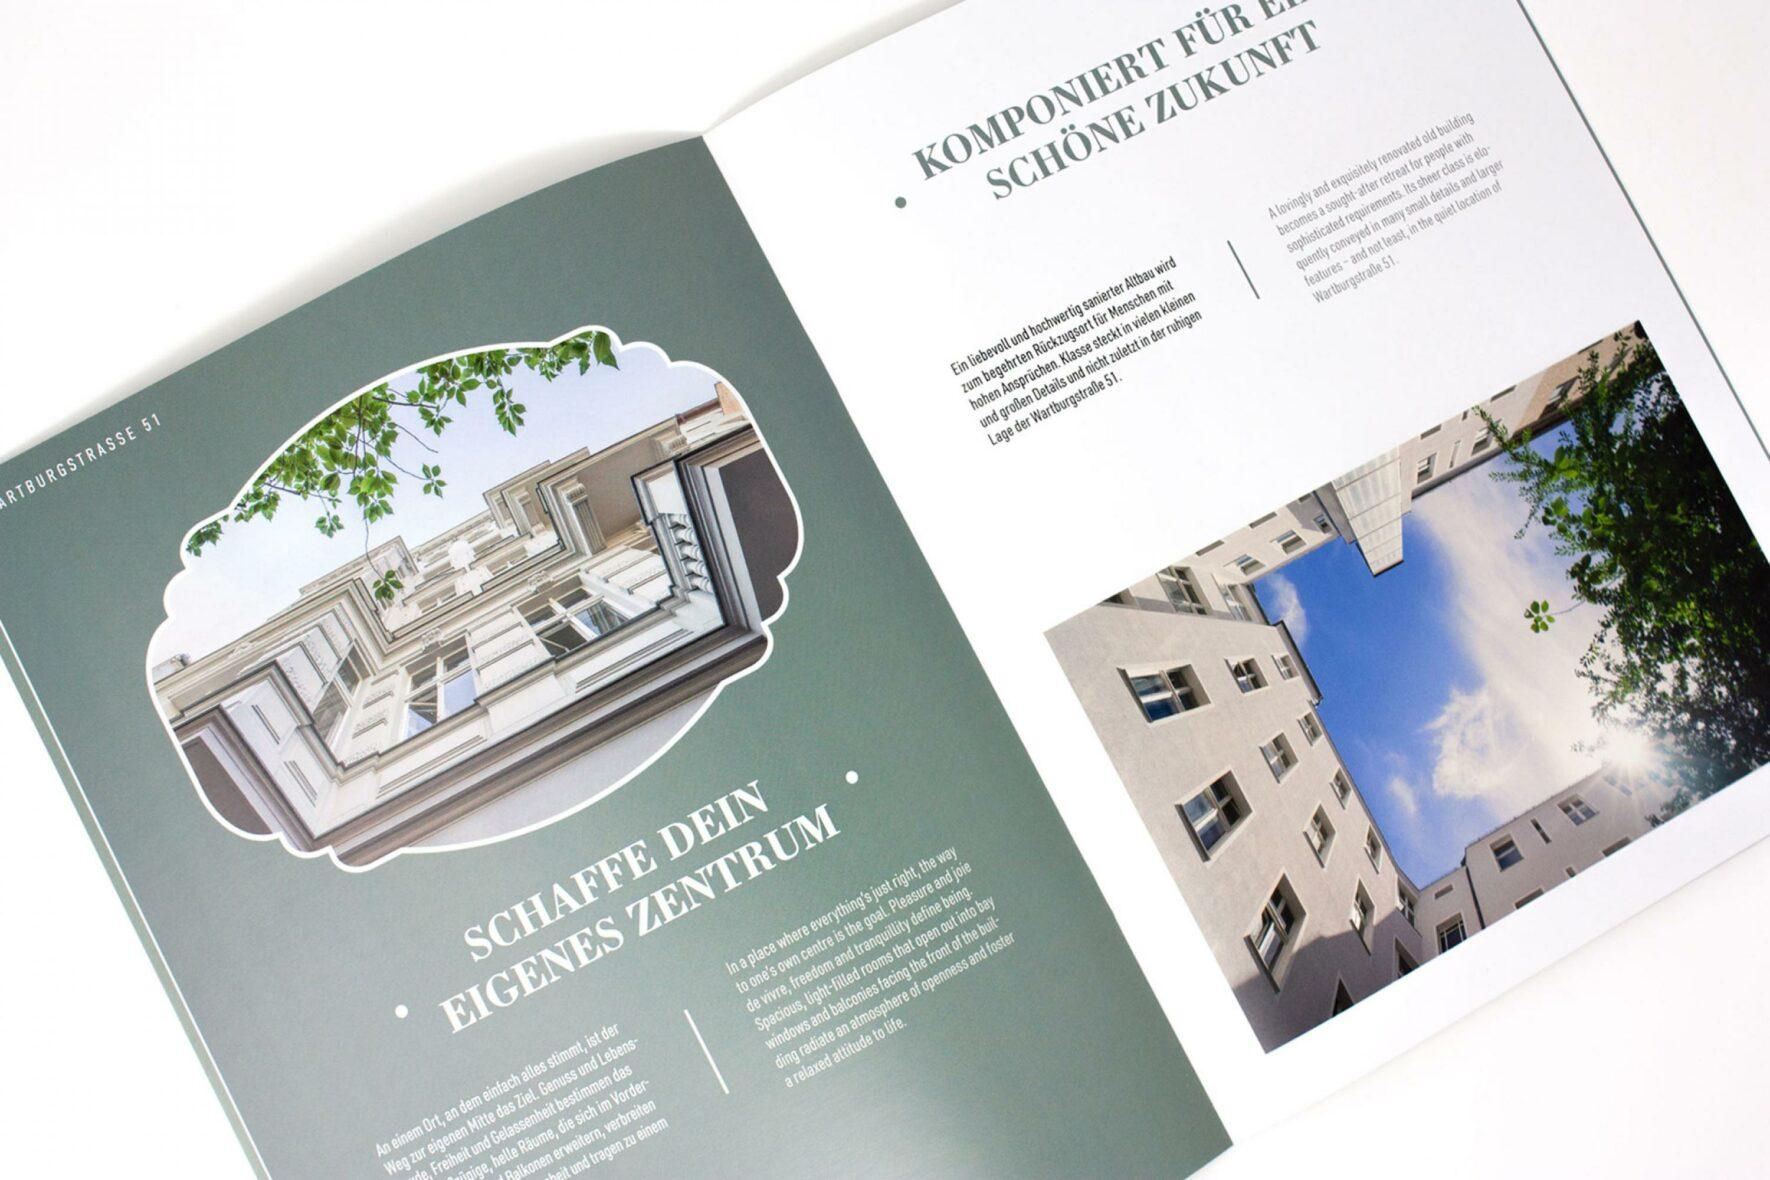 Immobilienbranding-wartburg-Trendcity-Broschüre-FORMLOS-berlin_MG_8293